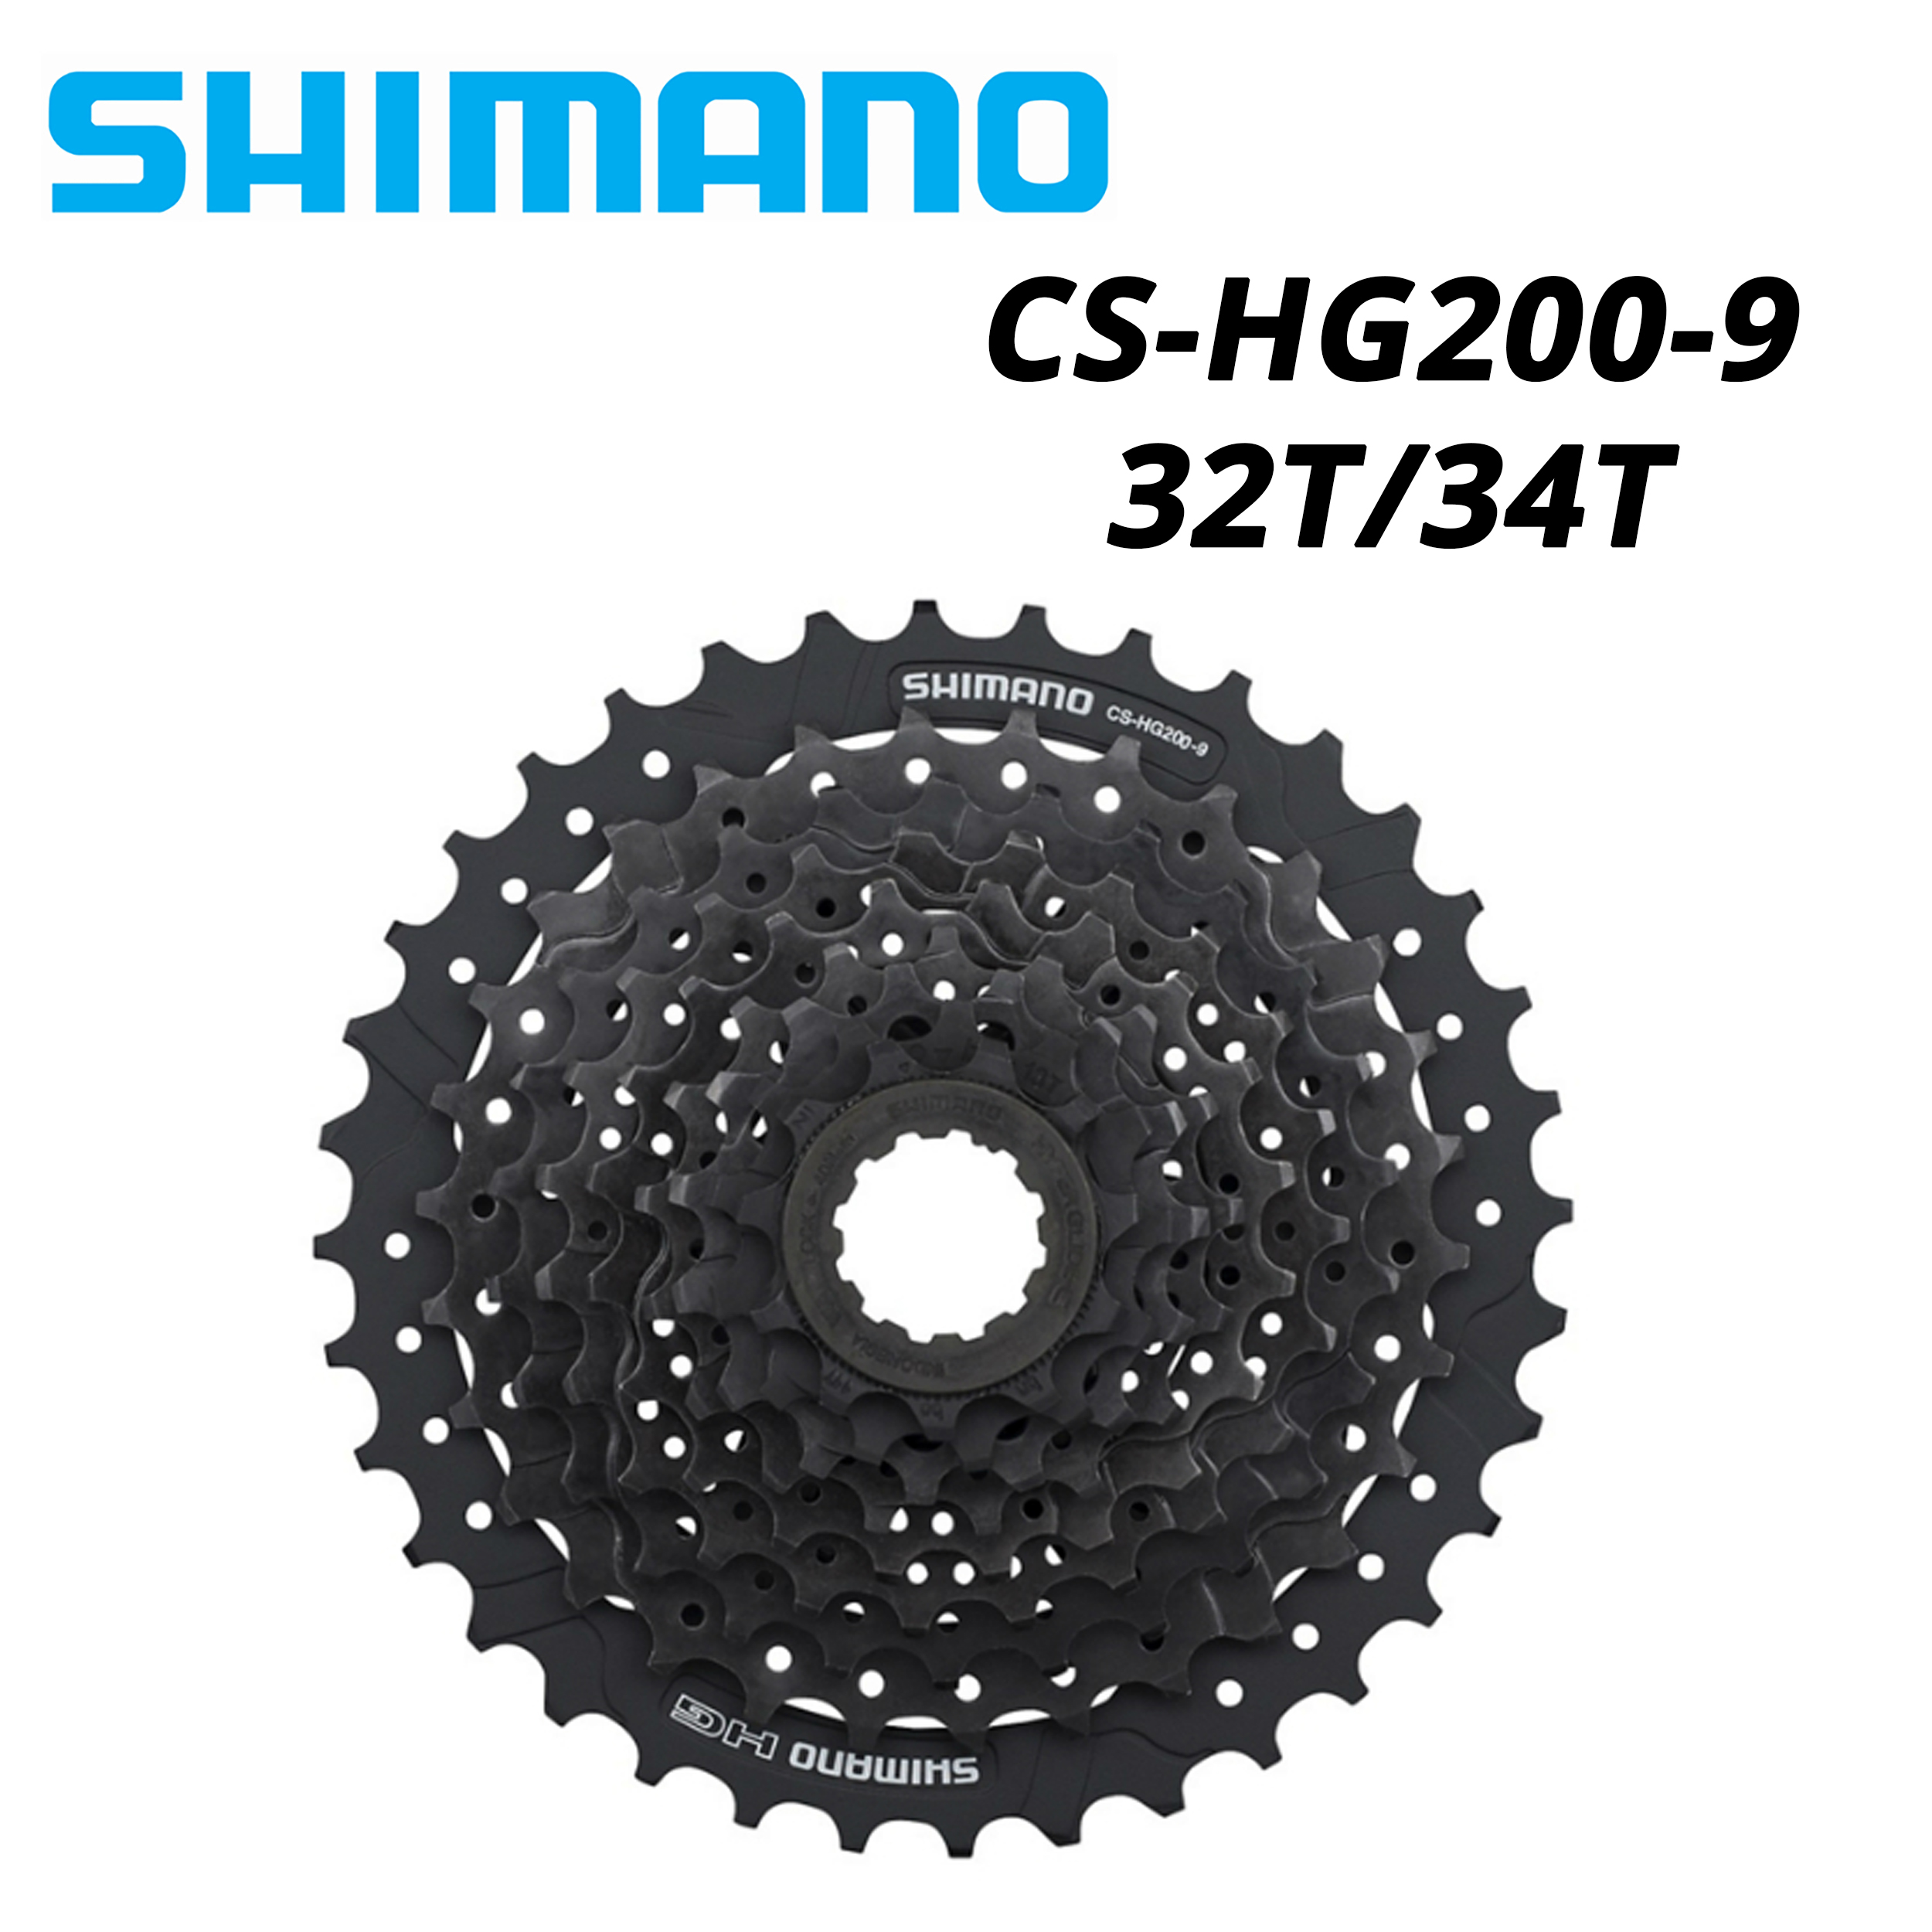 New Shimano CS-HG200-9 Hyperglide Bicycle Cassette 9 Spd 11-32T Road MTB Hybrid